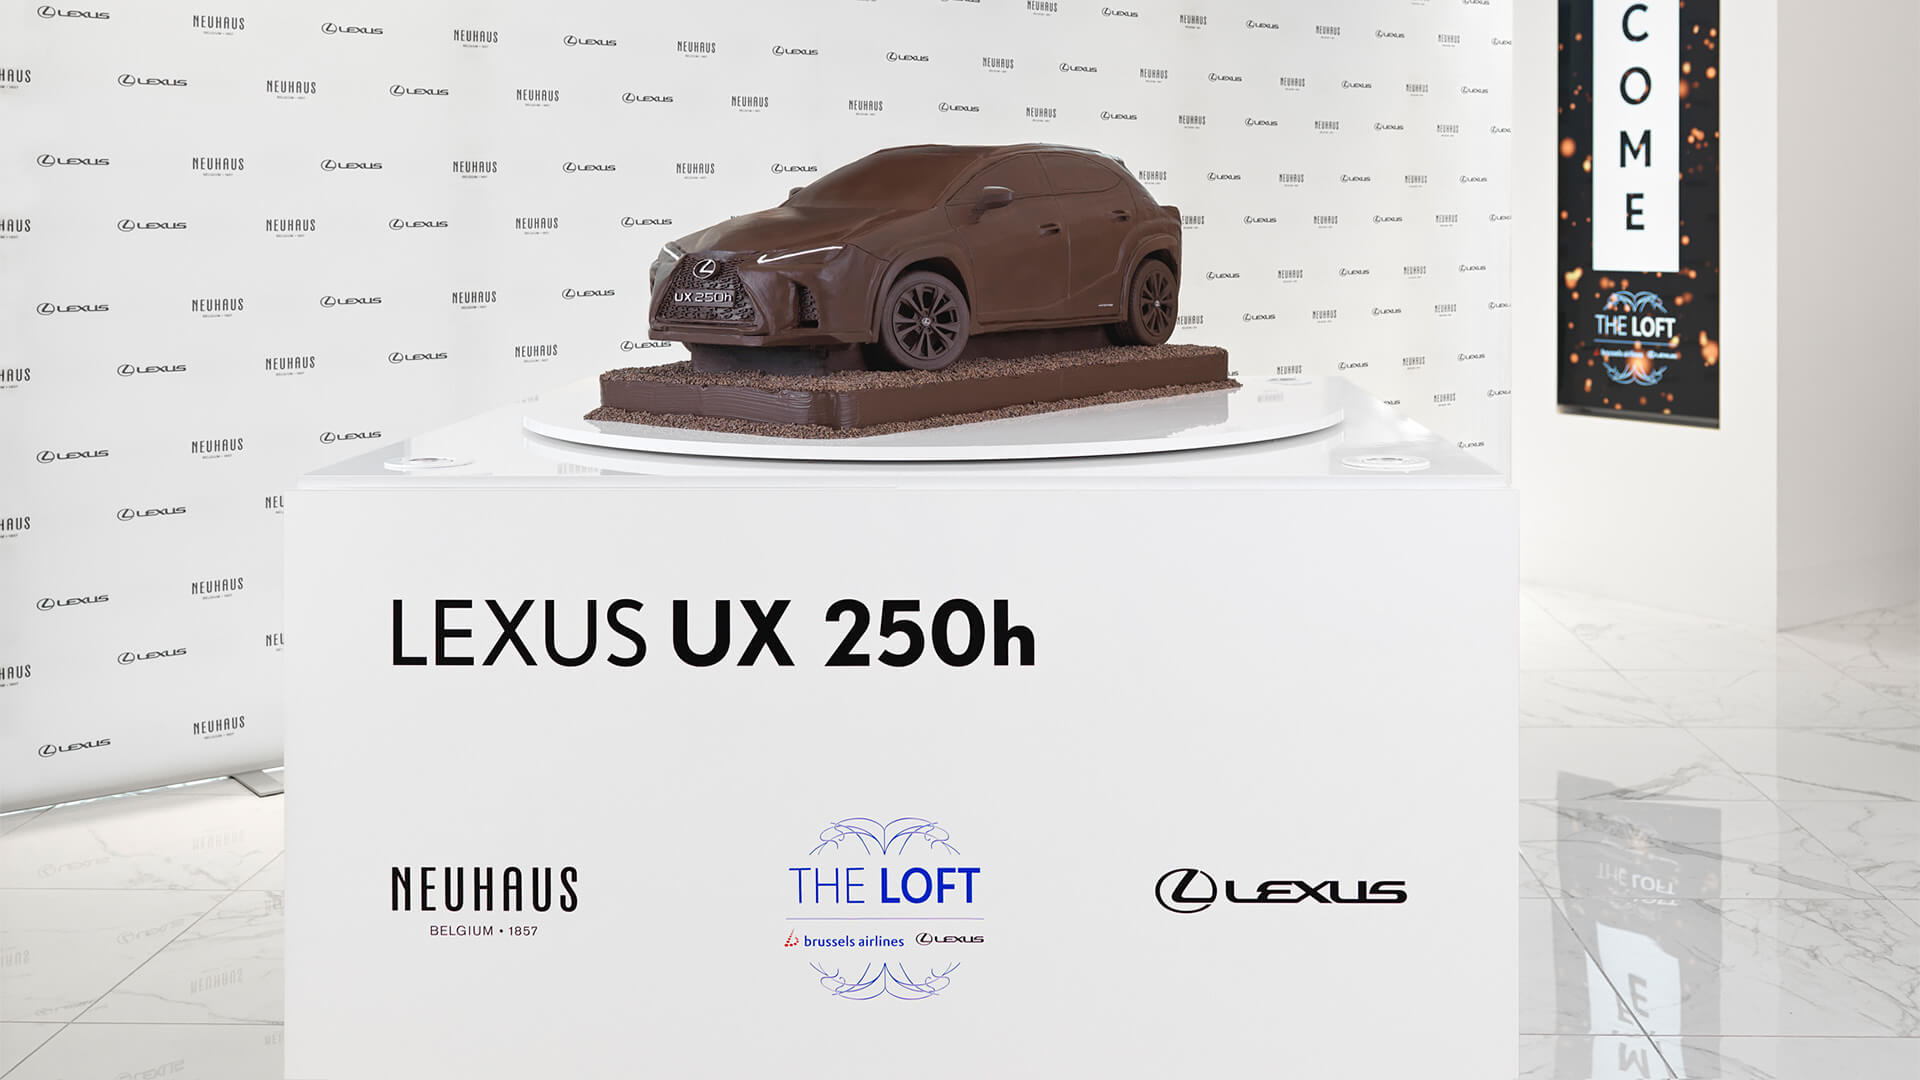 2019 lexus lounge UX Chocolate Car 1920x1080 04